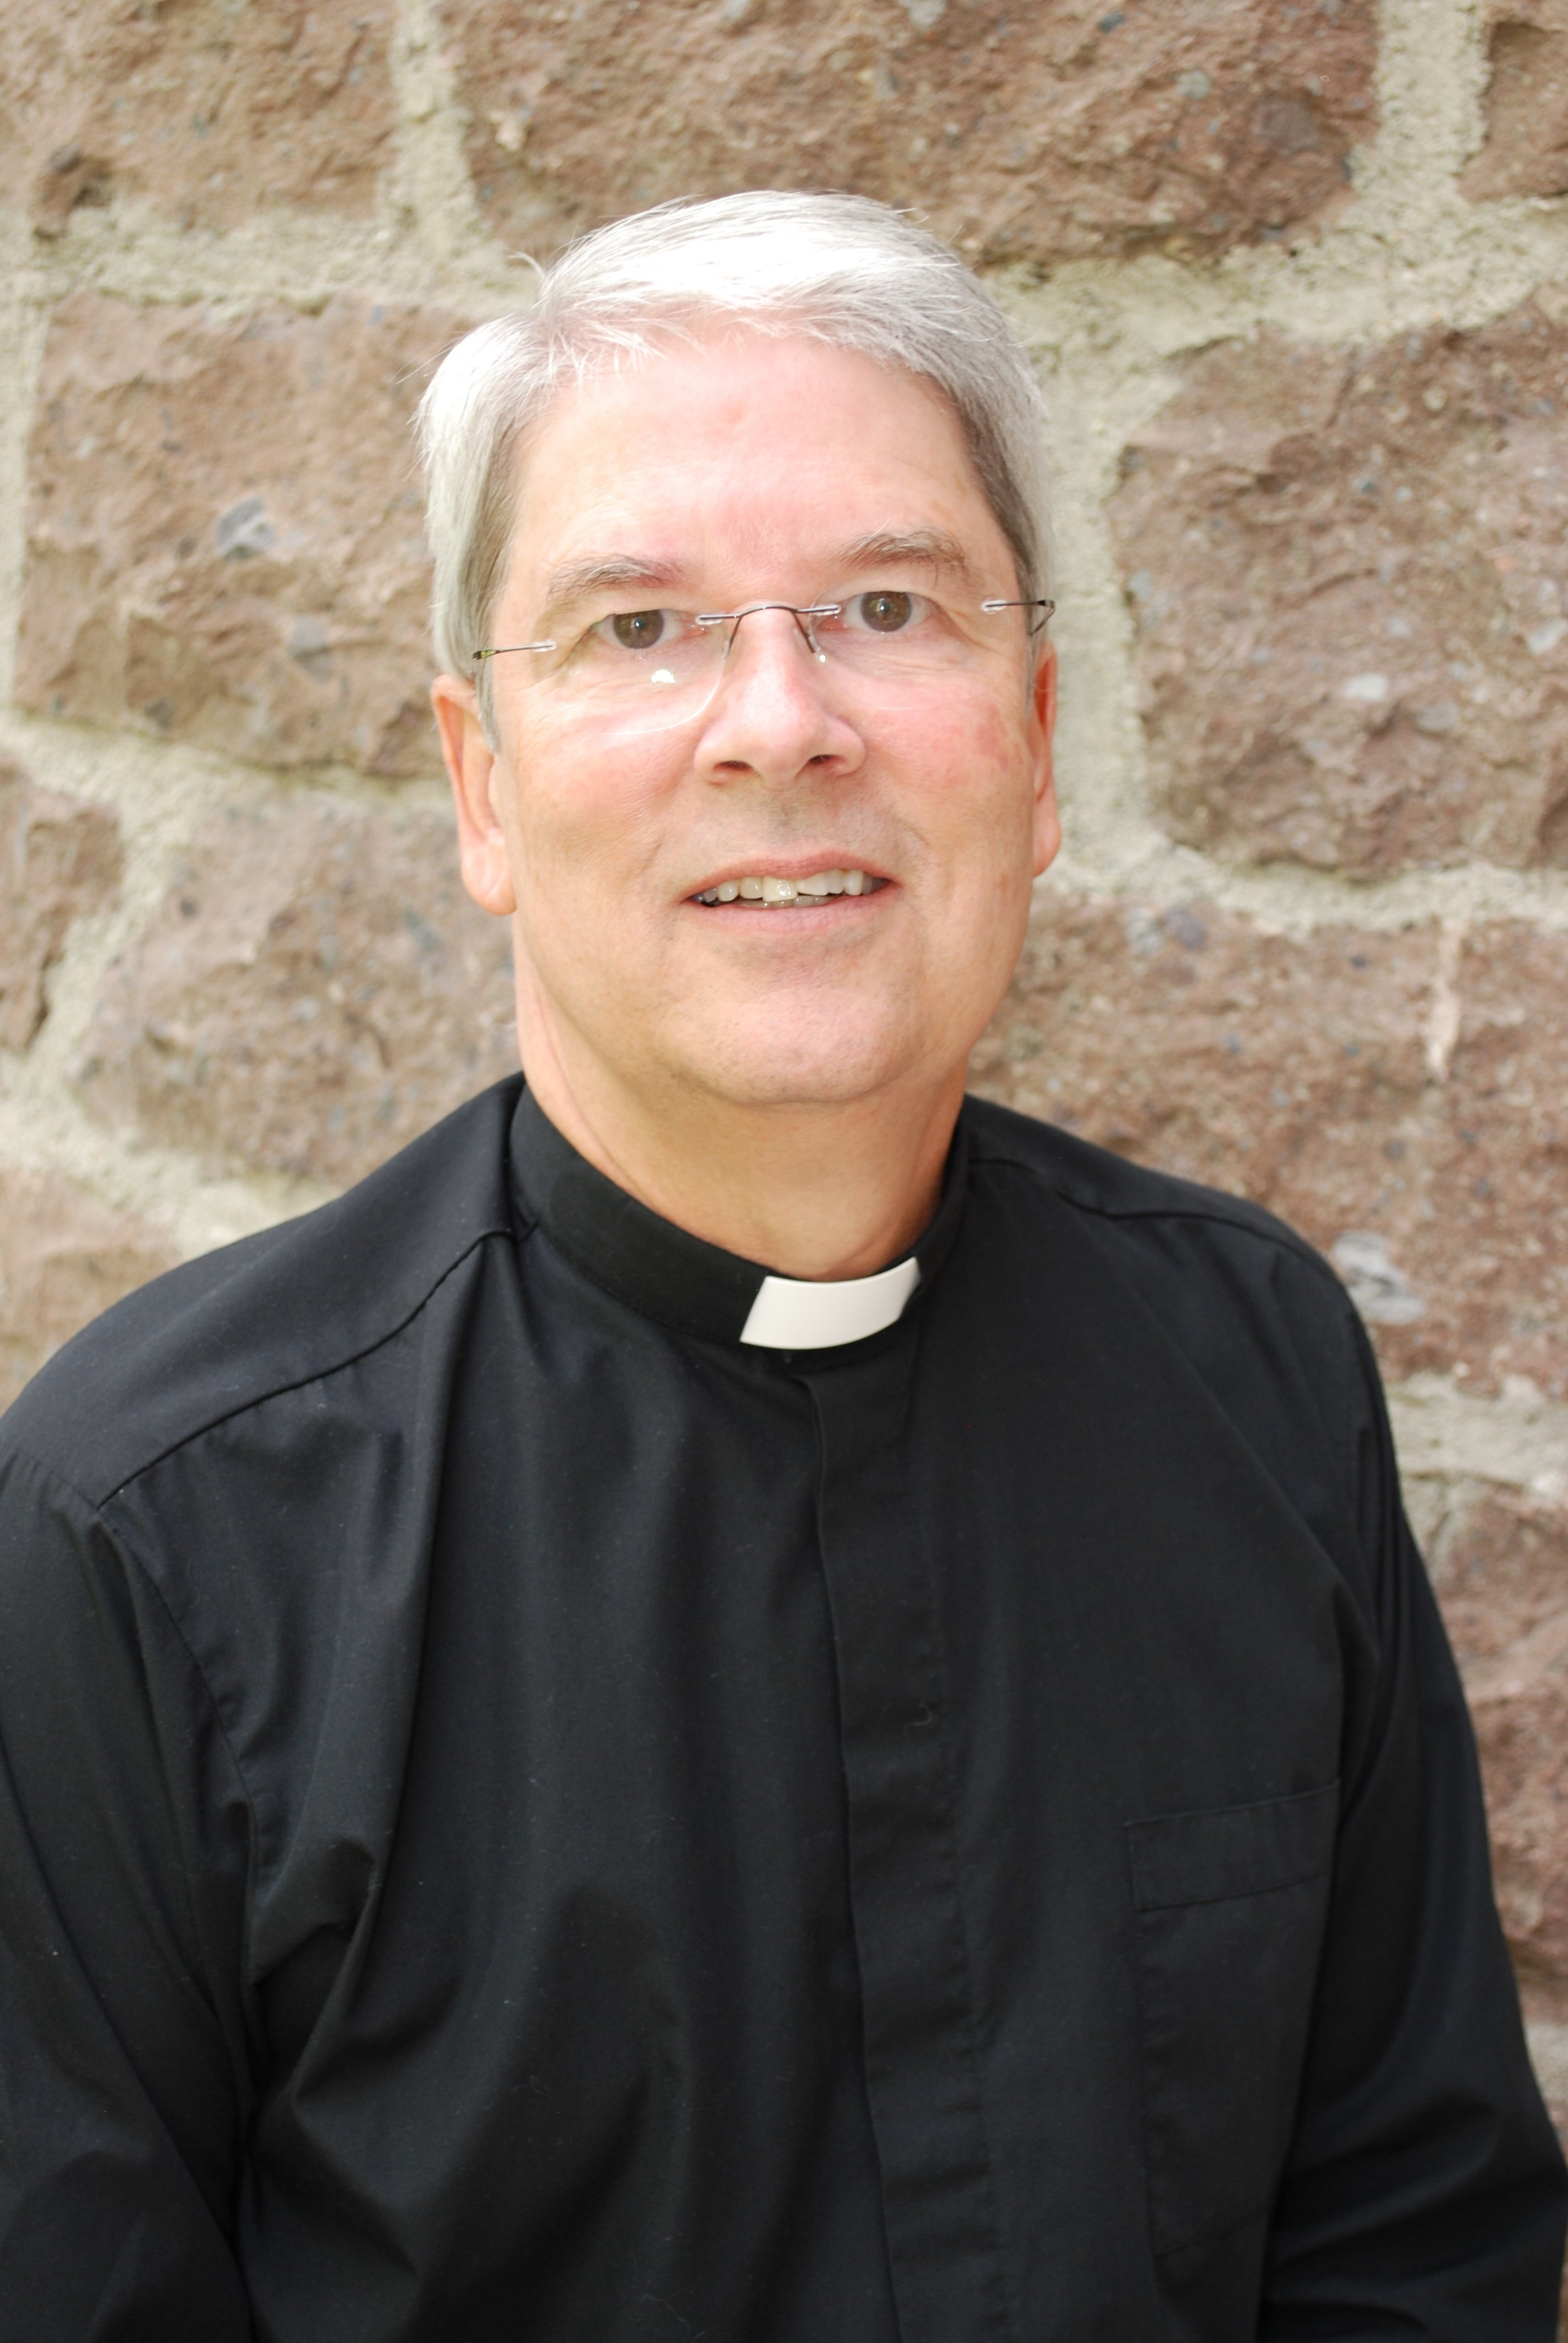 The Very Rev. Scott Anderson  Dean  dean@stpeterscathedral.net